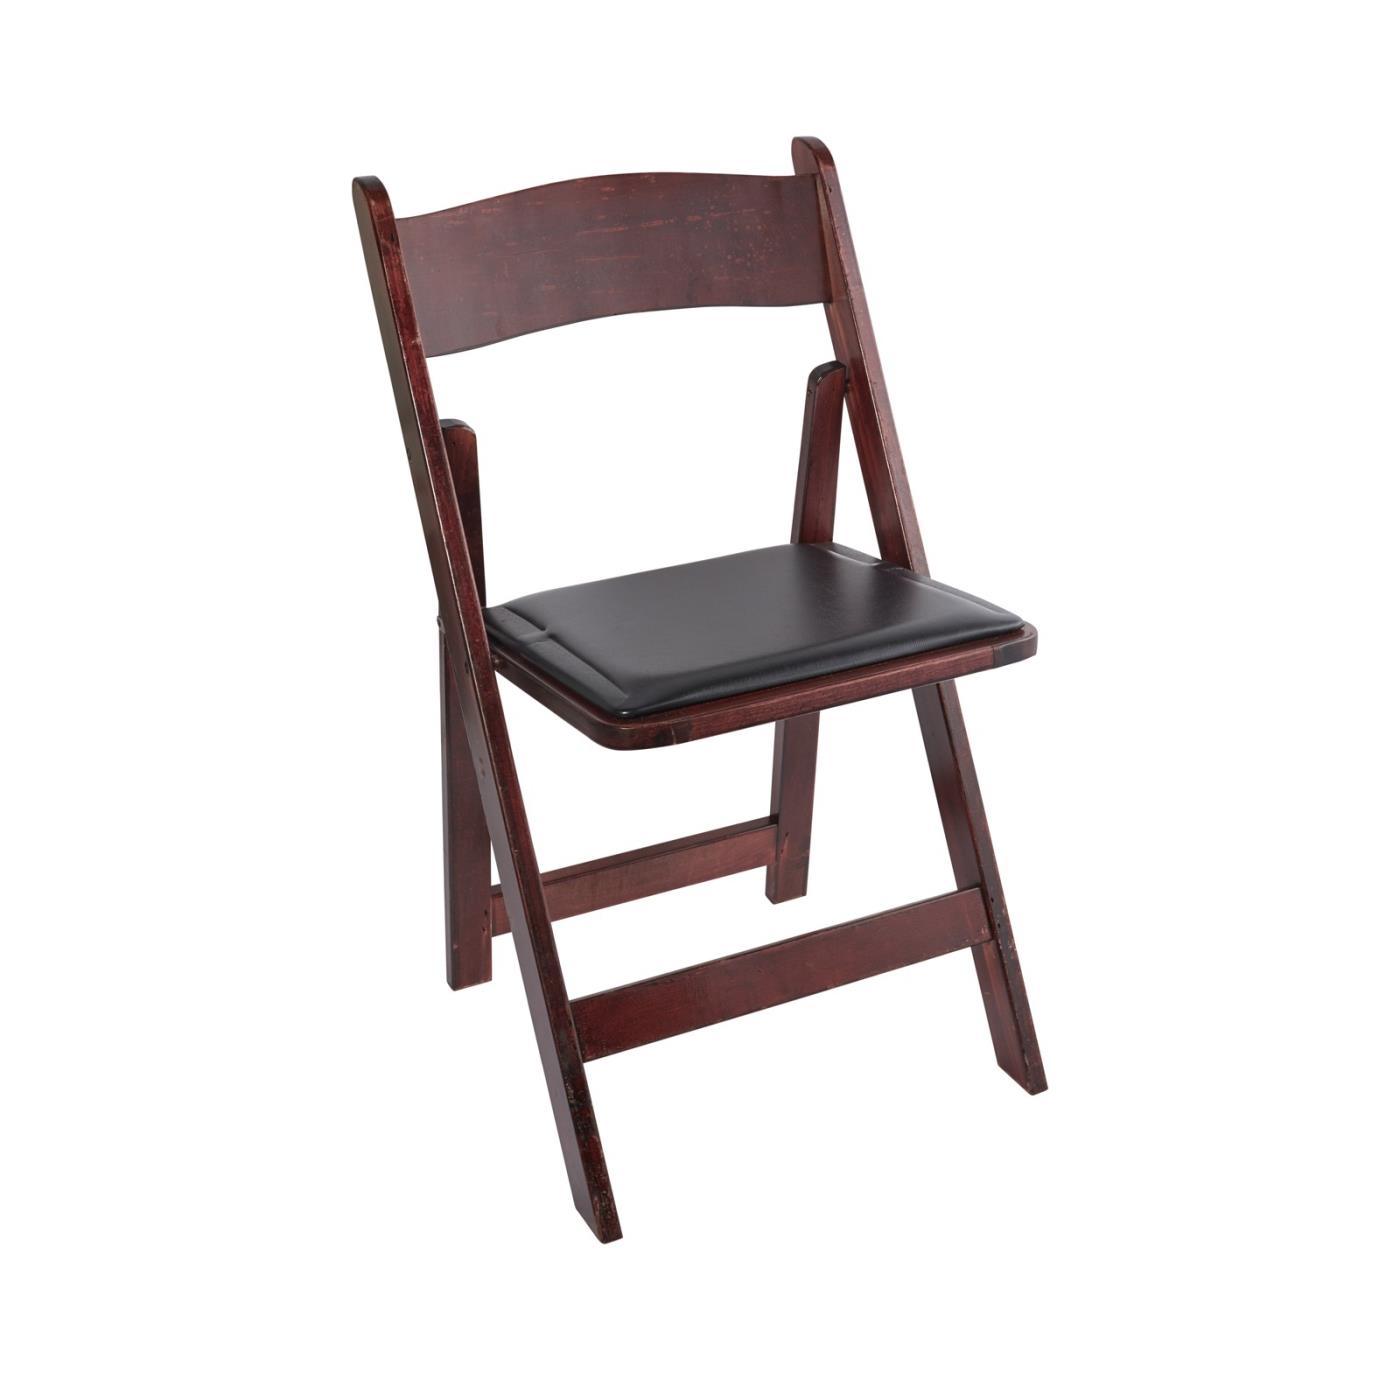 Wood Folding Chair - Mahogany Light